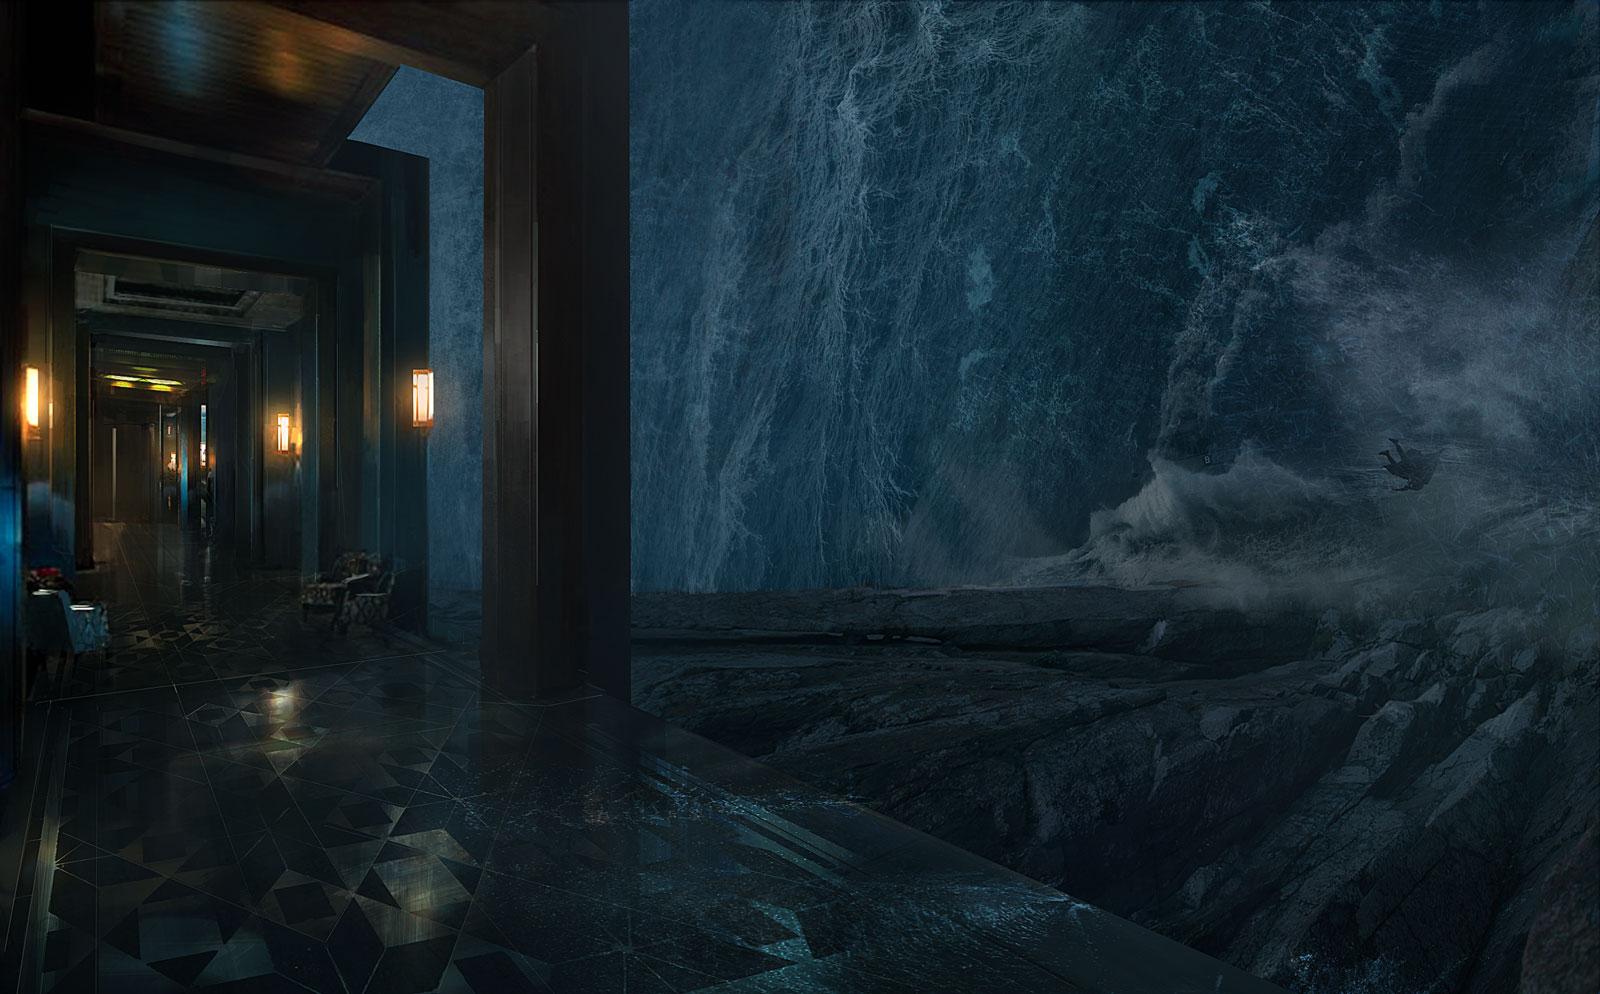 Corridor / Alternate dimension